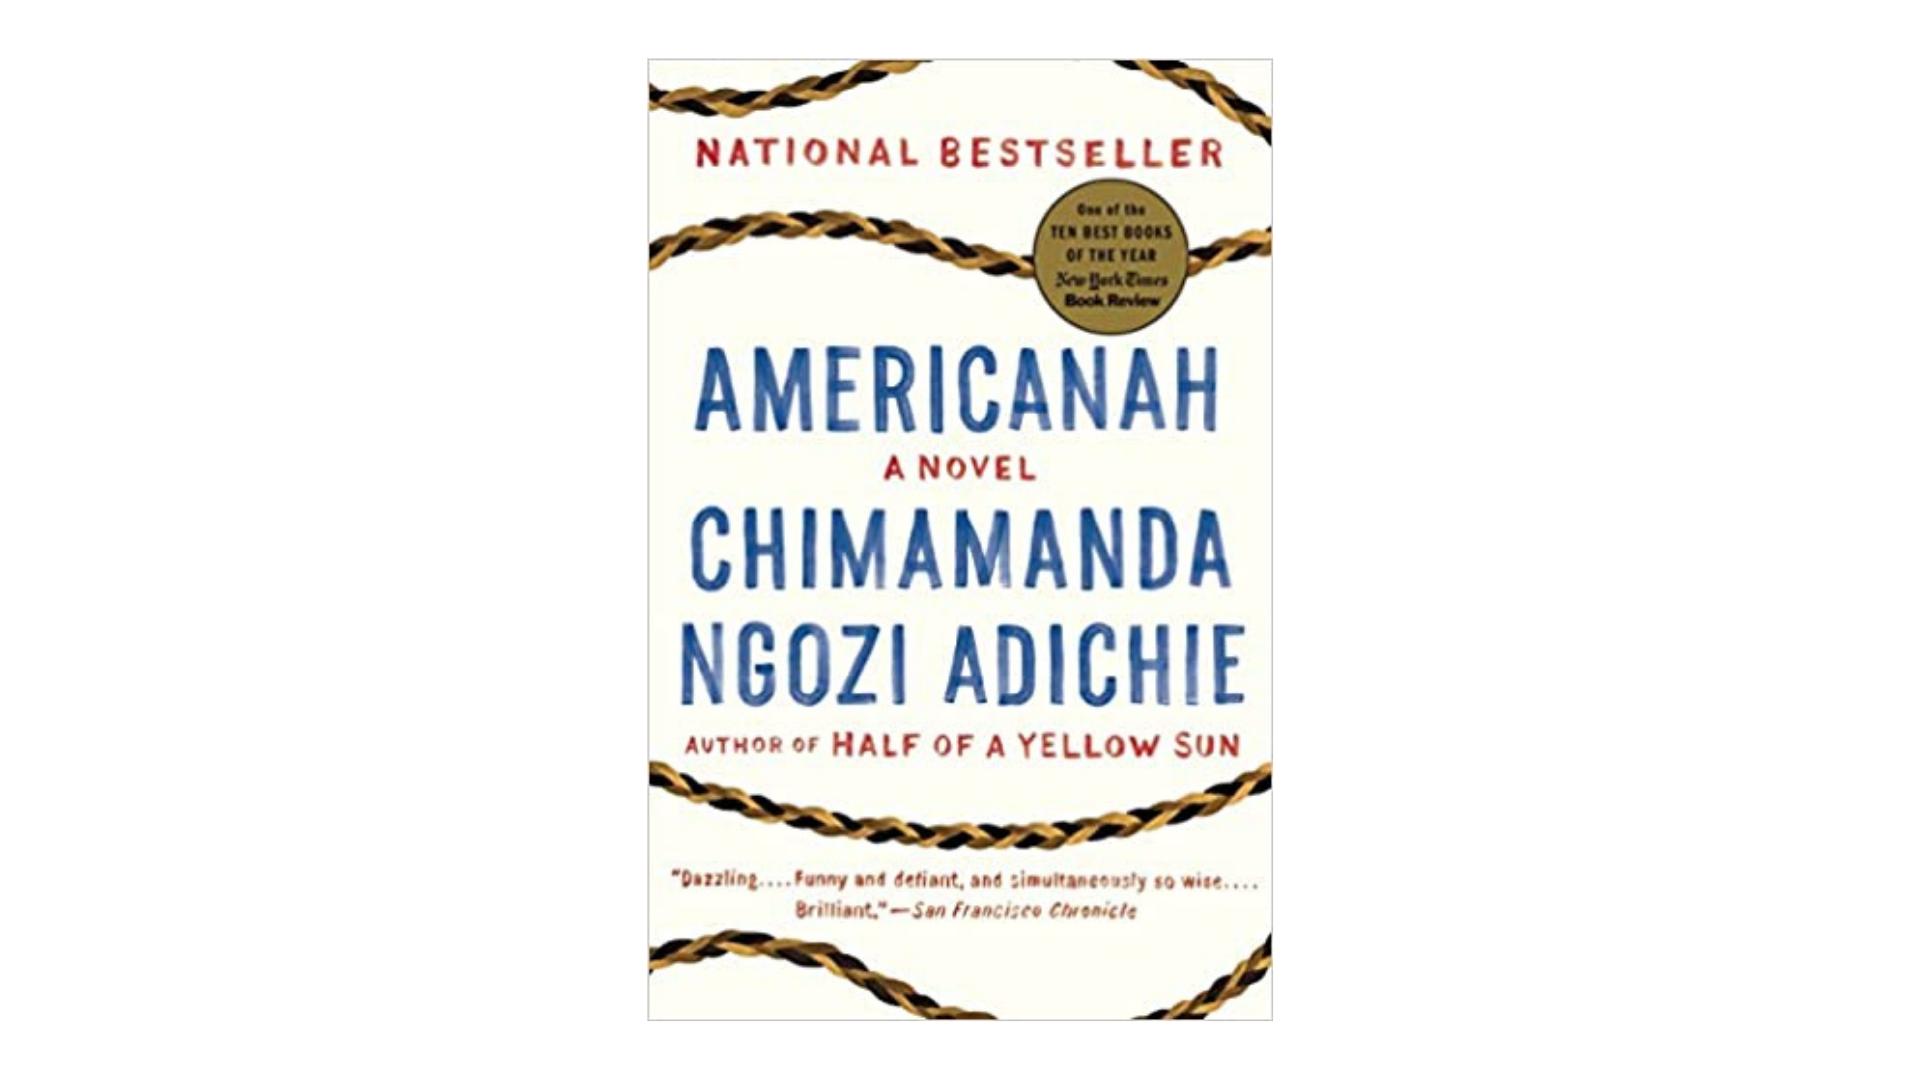 Chimamanda best books by black authors